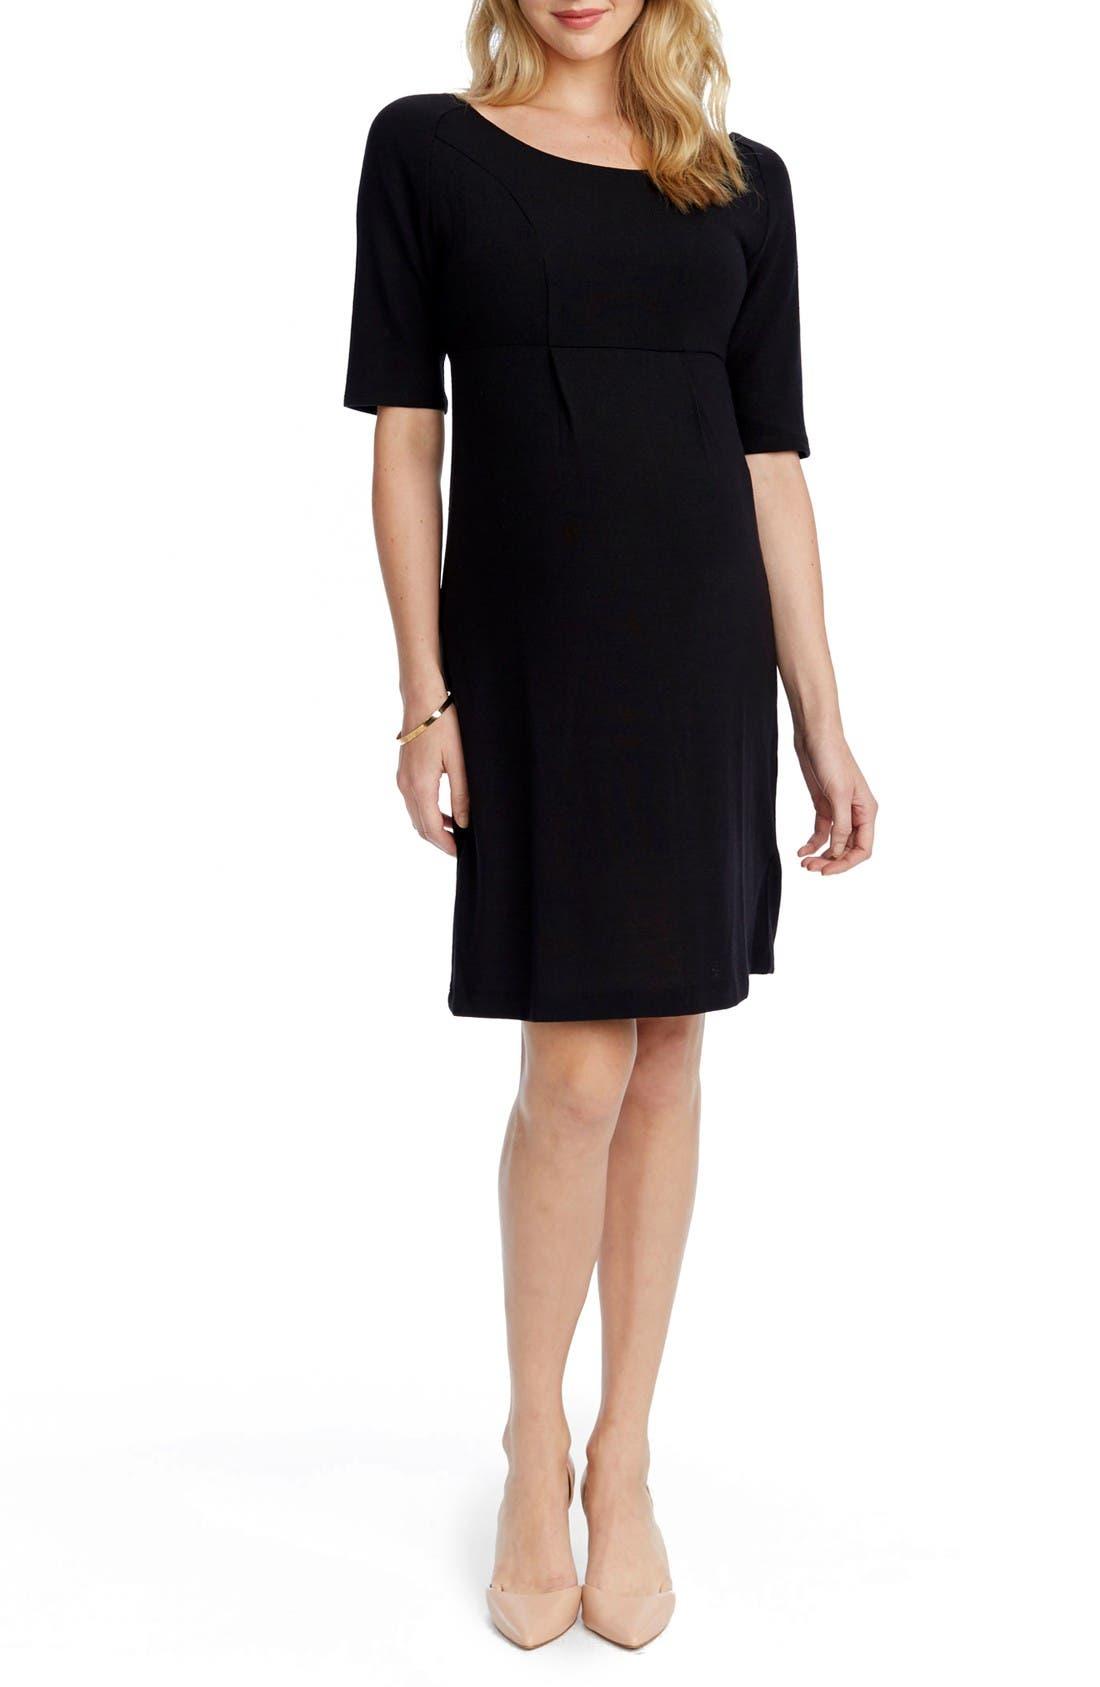 ROSIE POPE Avery Maternity Sheath Dress in Black